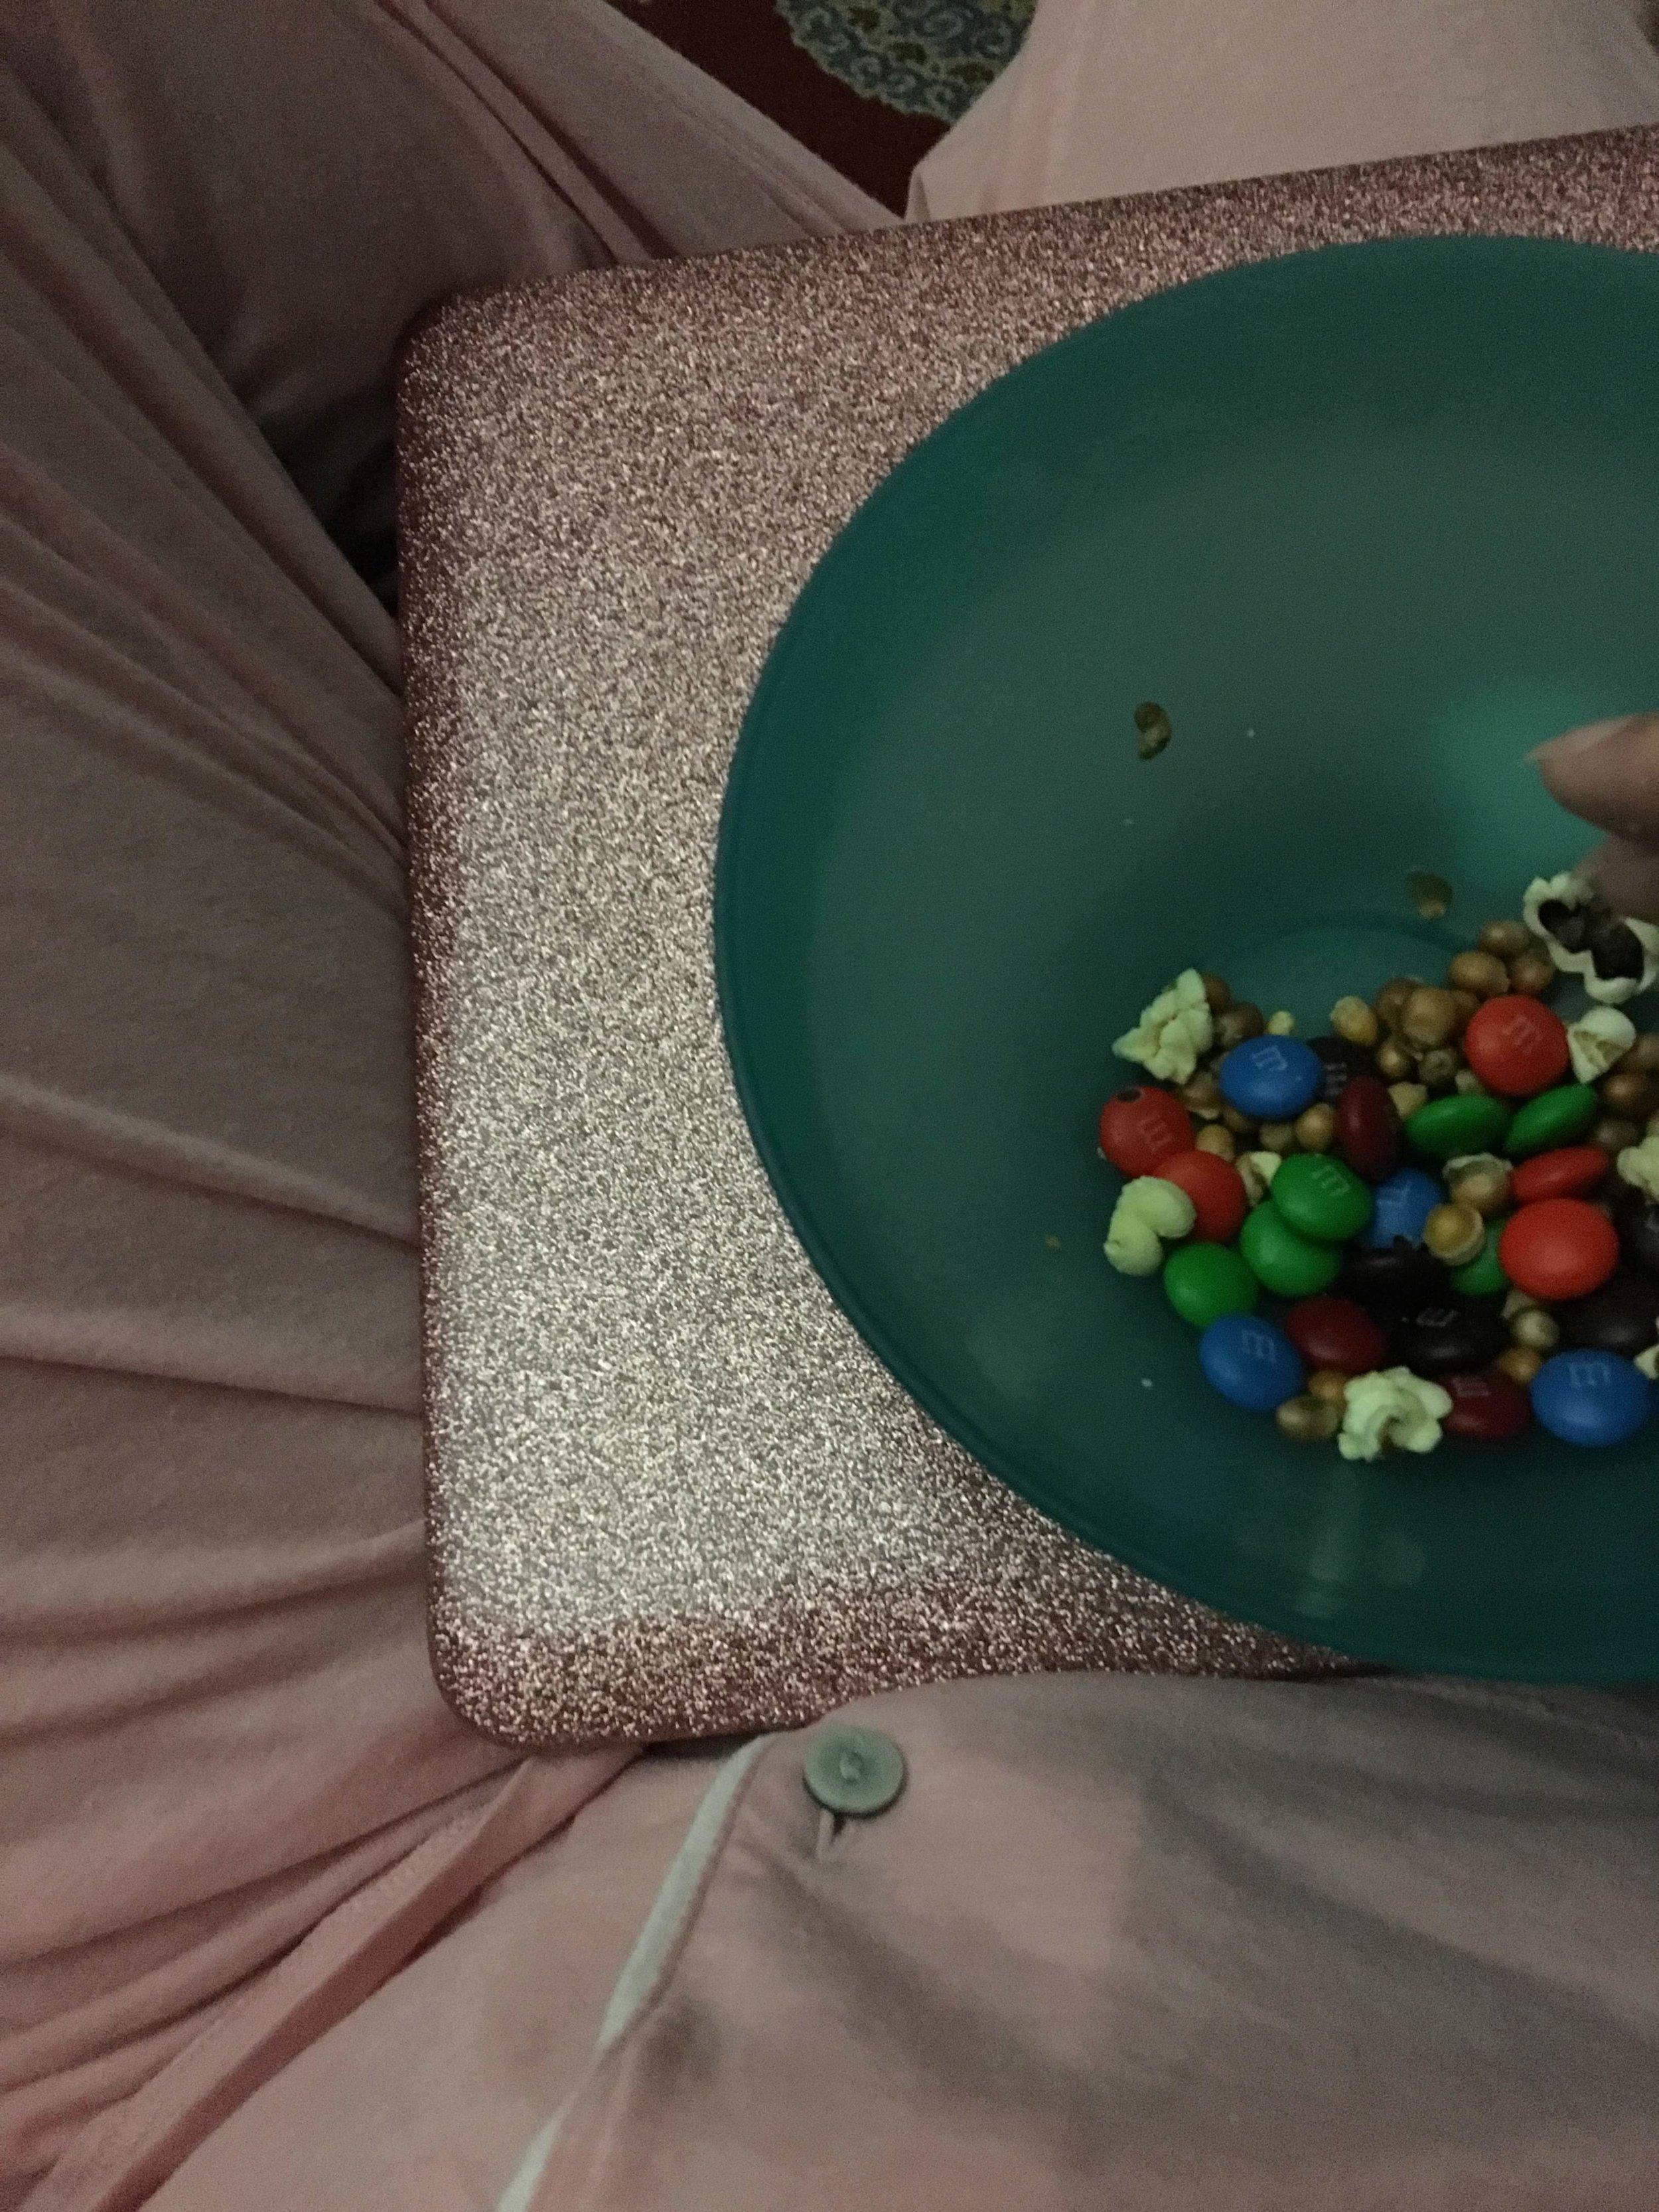 ashlee-laptop-popcorn.jpg